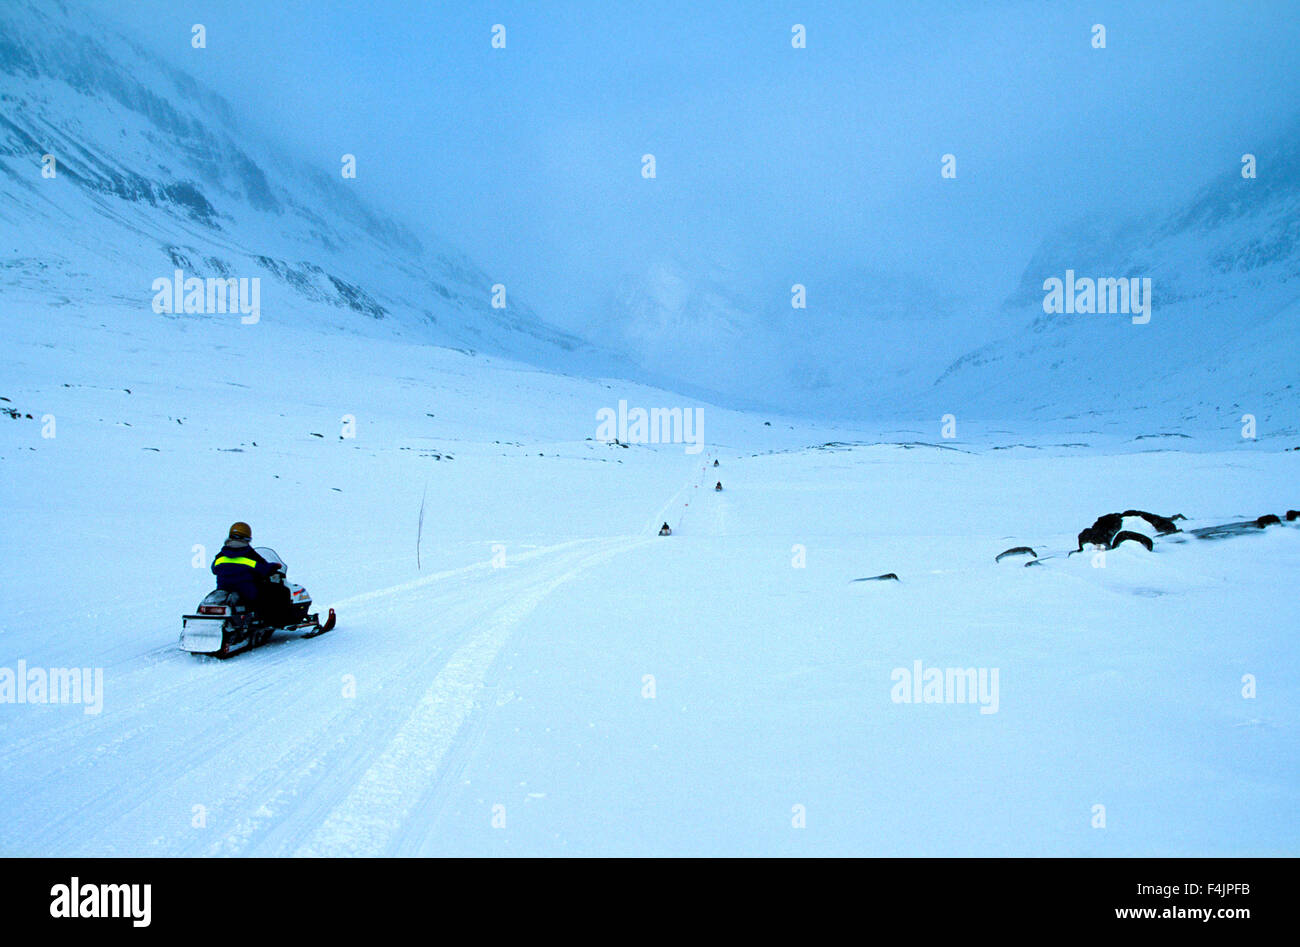 Sweden, Kungsleden, Man on snowmobile - Stock Image